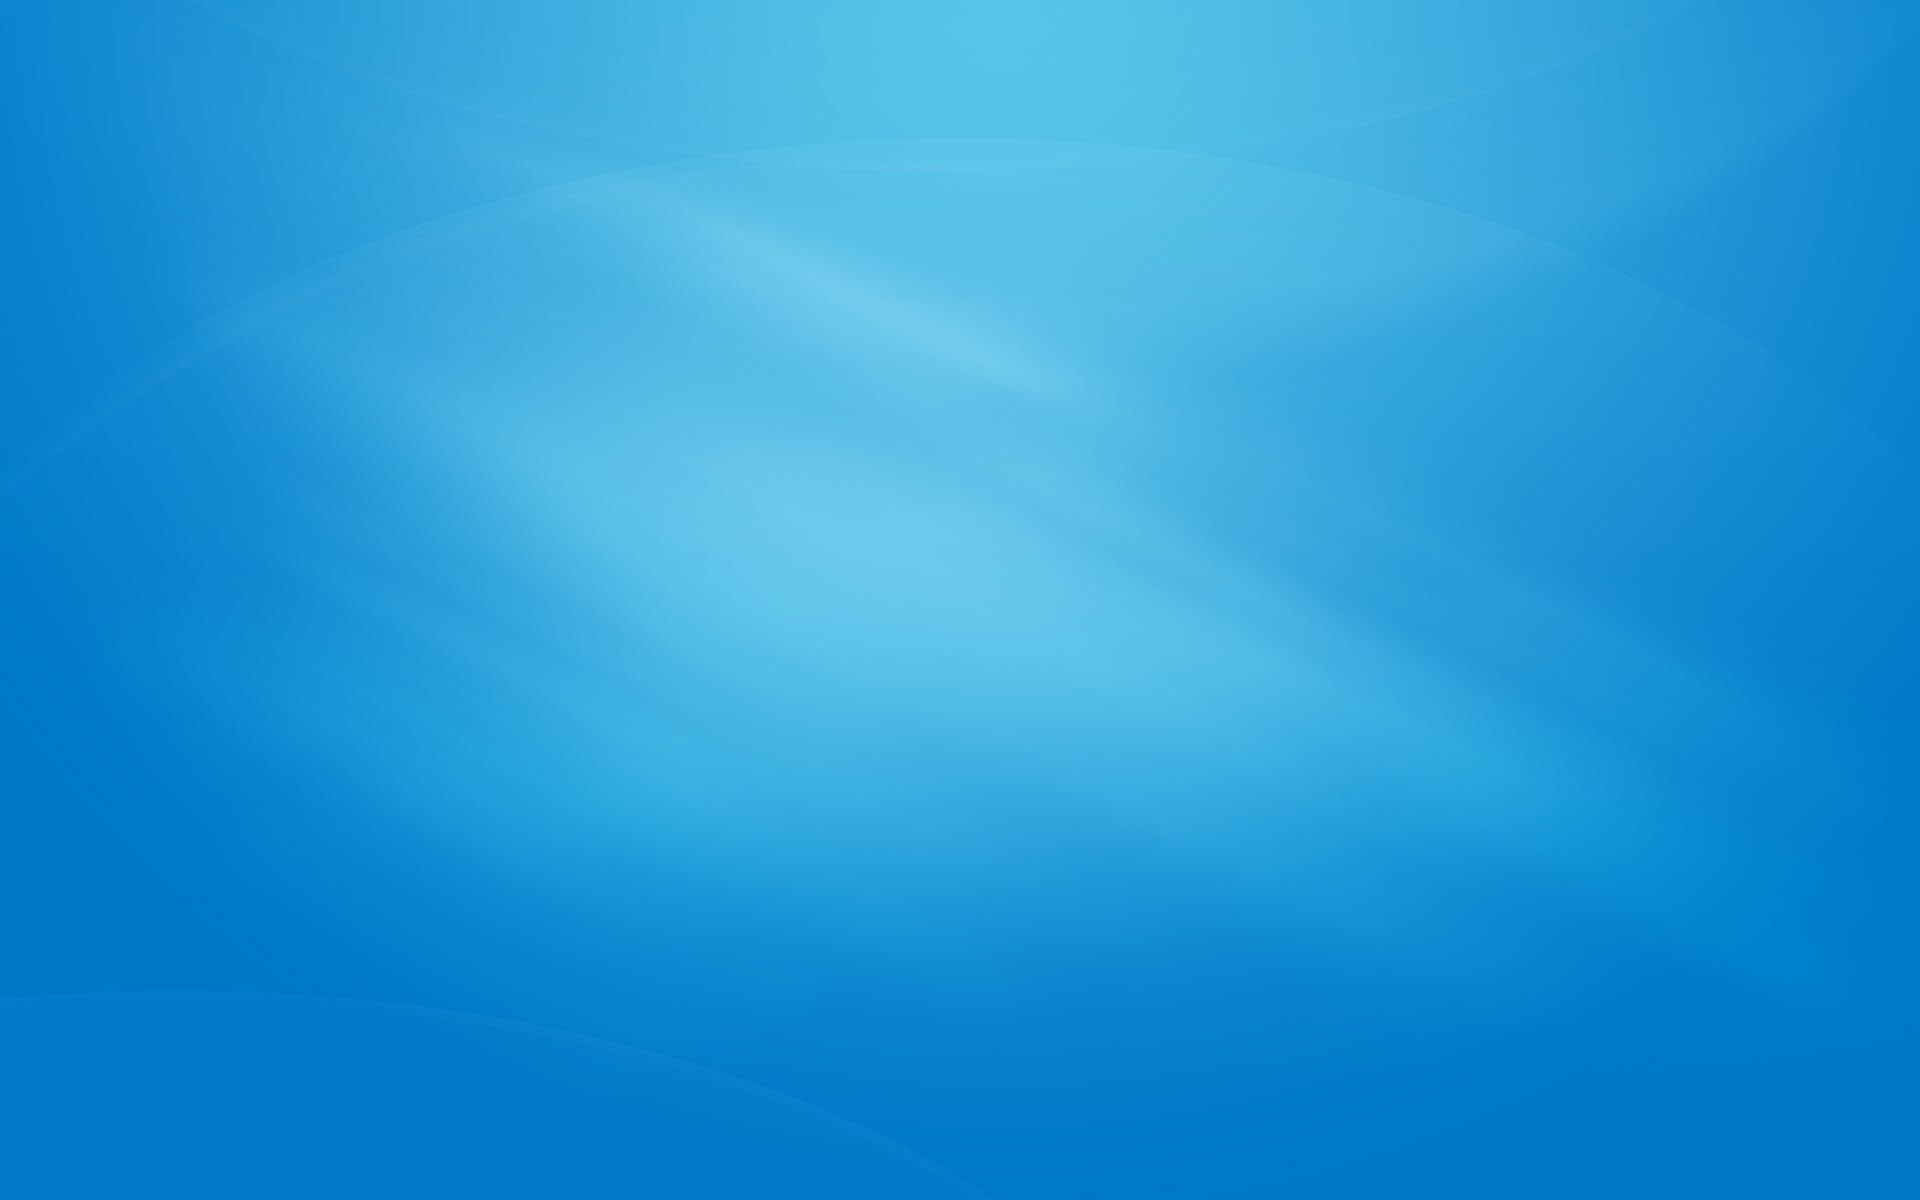 sky-blue-color-wallpaper-4